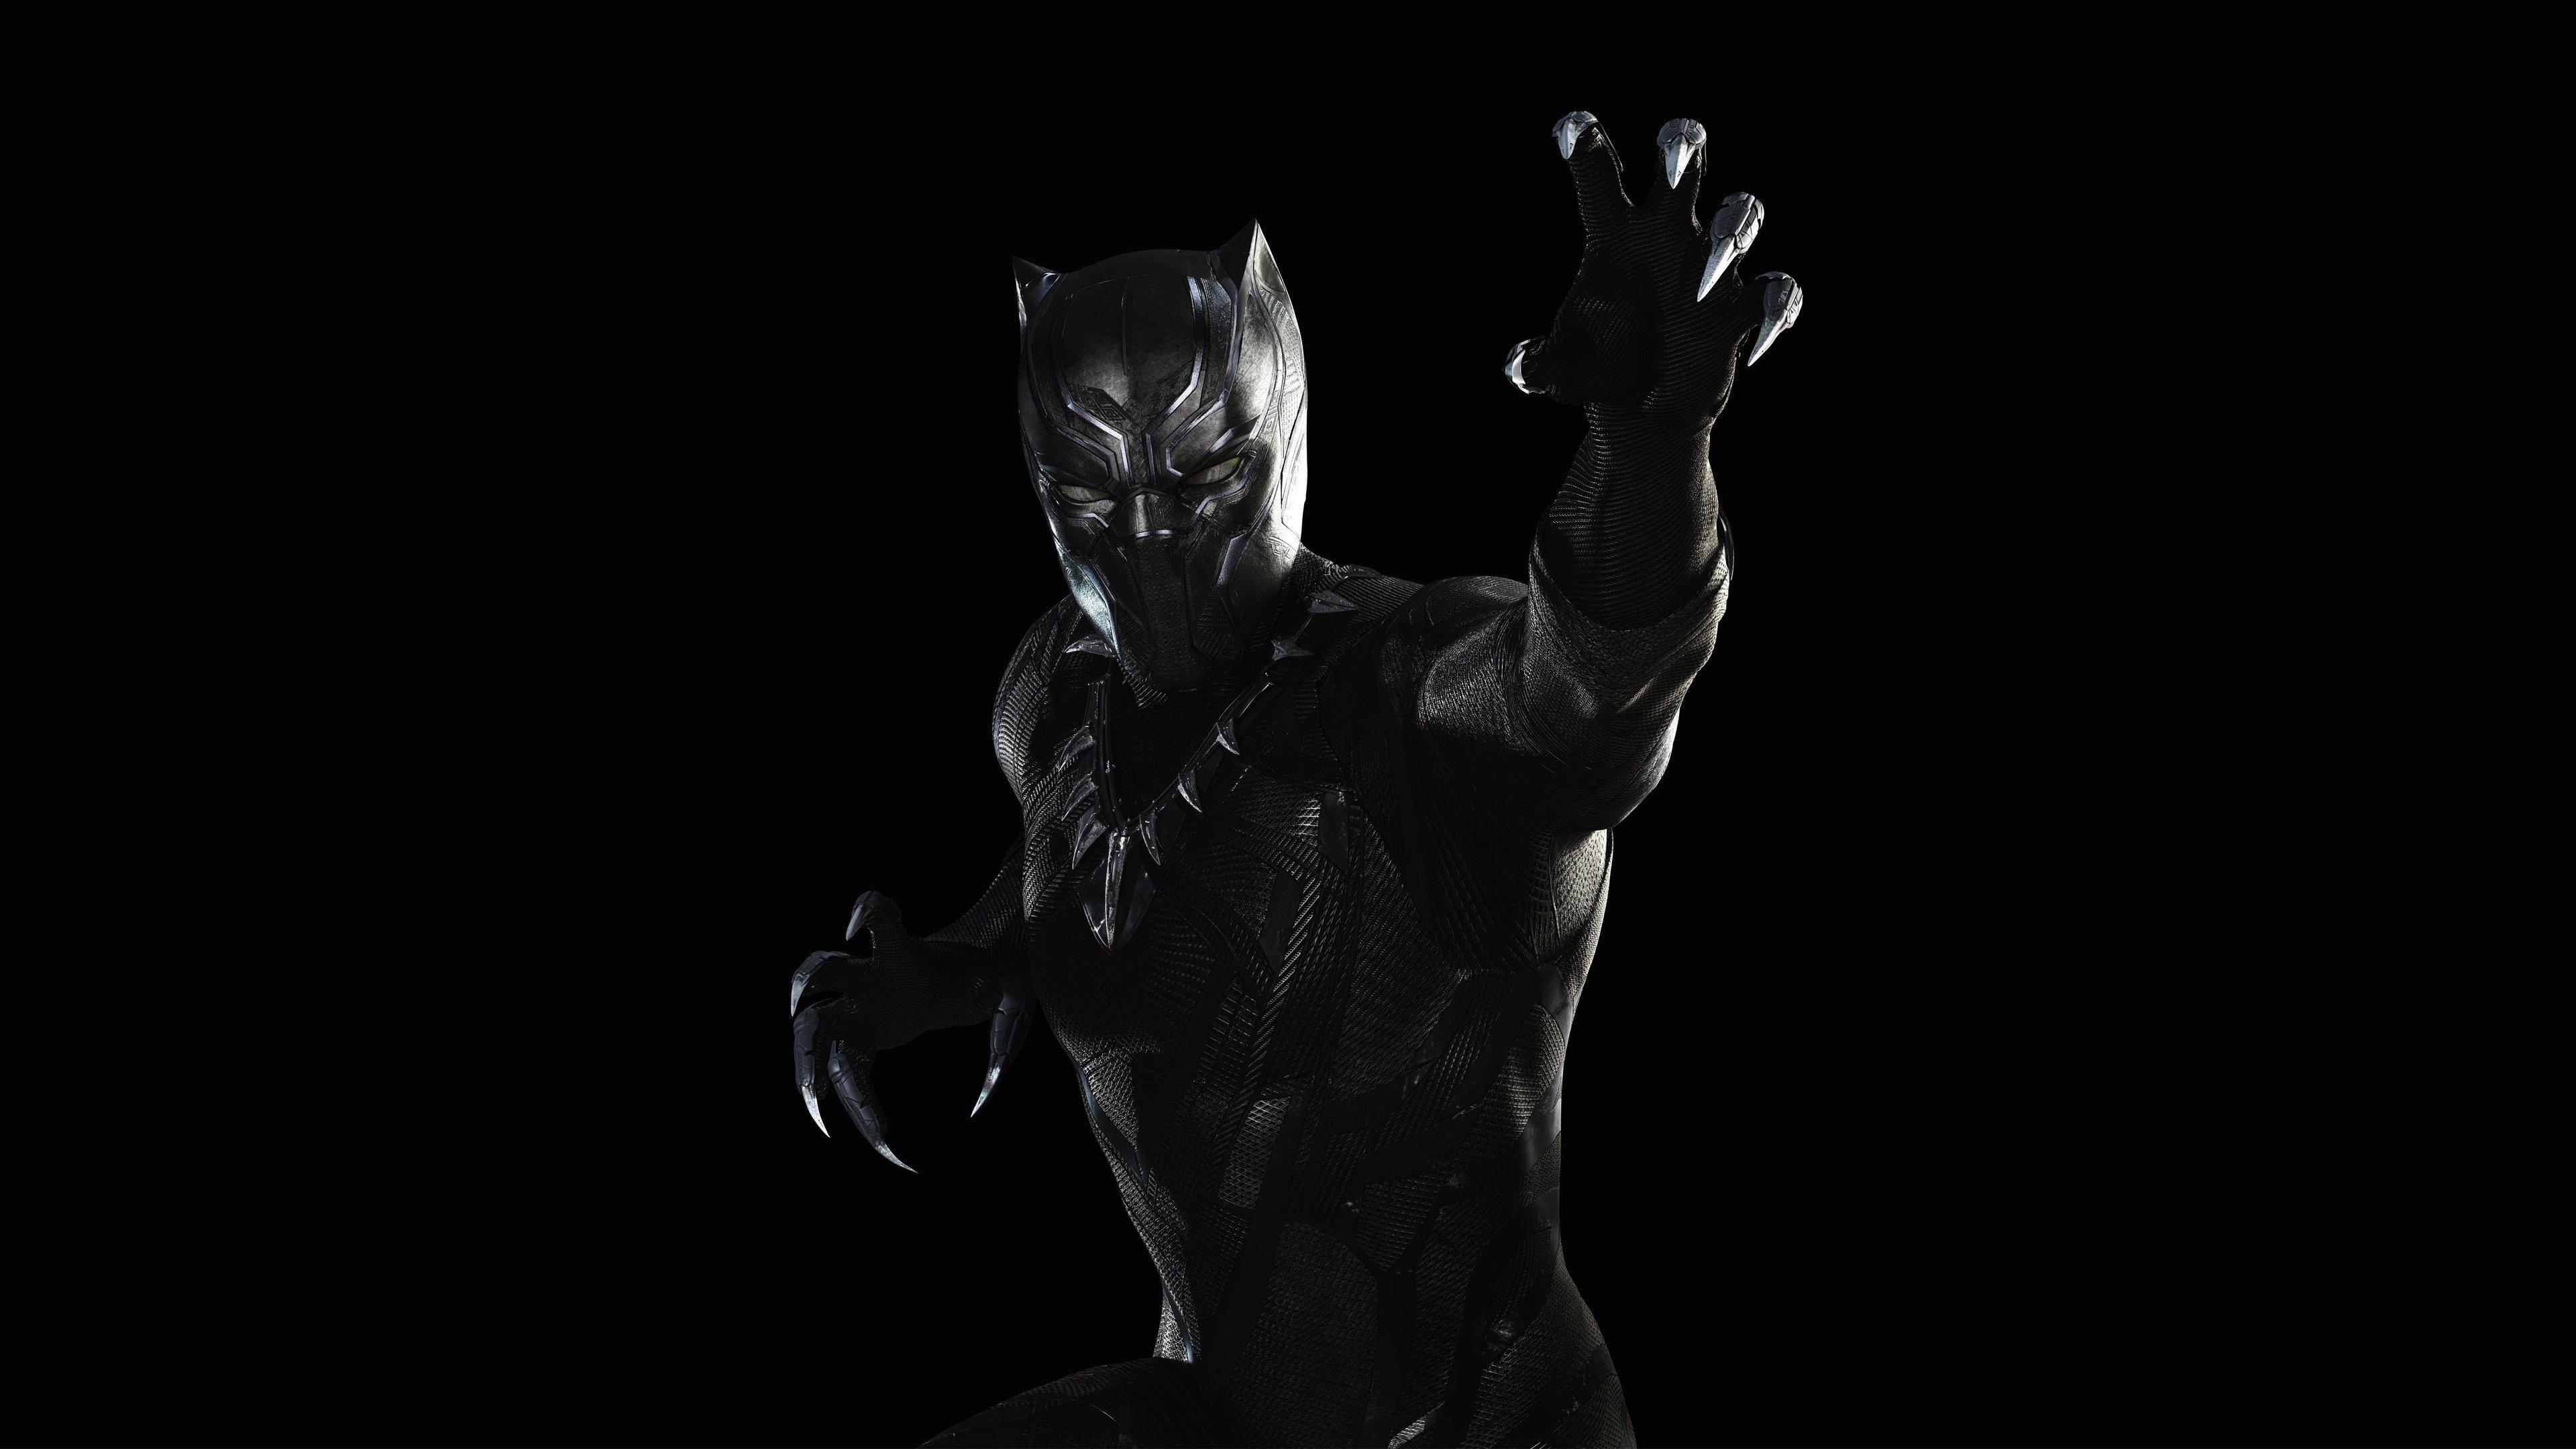 Black Panther Wallpaper High Resolution ~ Sdeerwallpaper